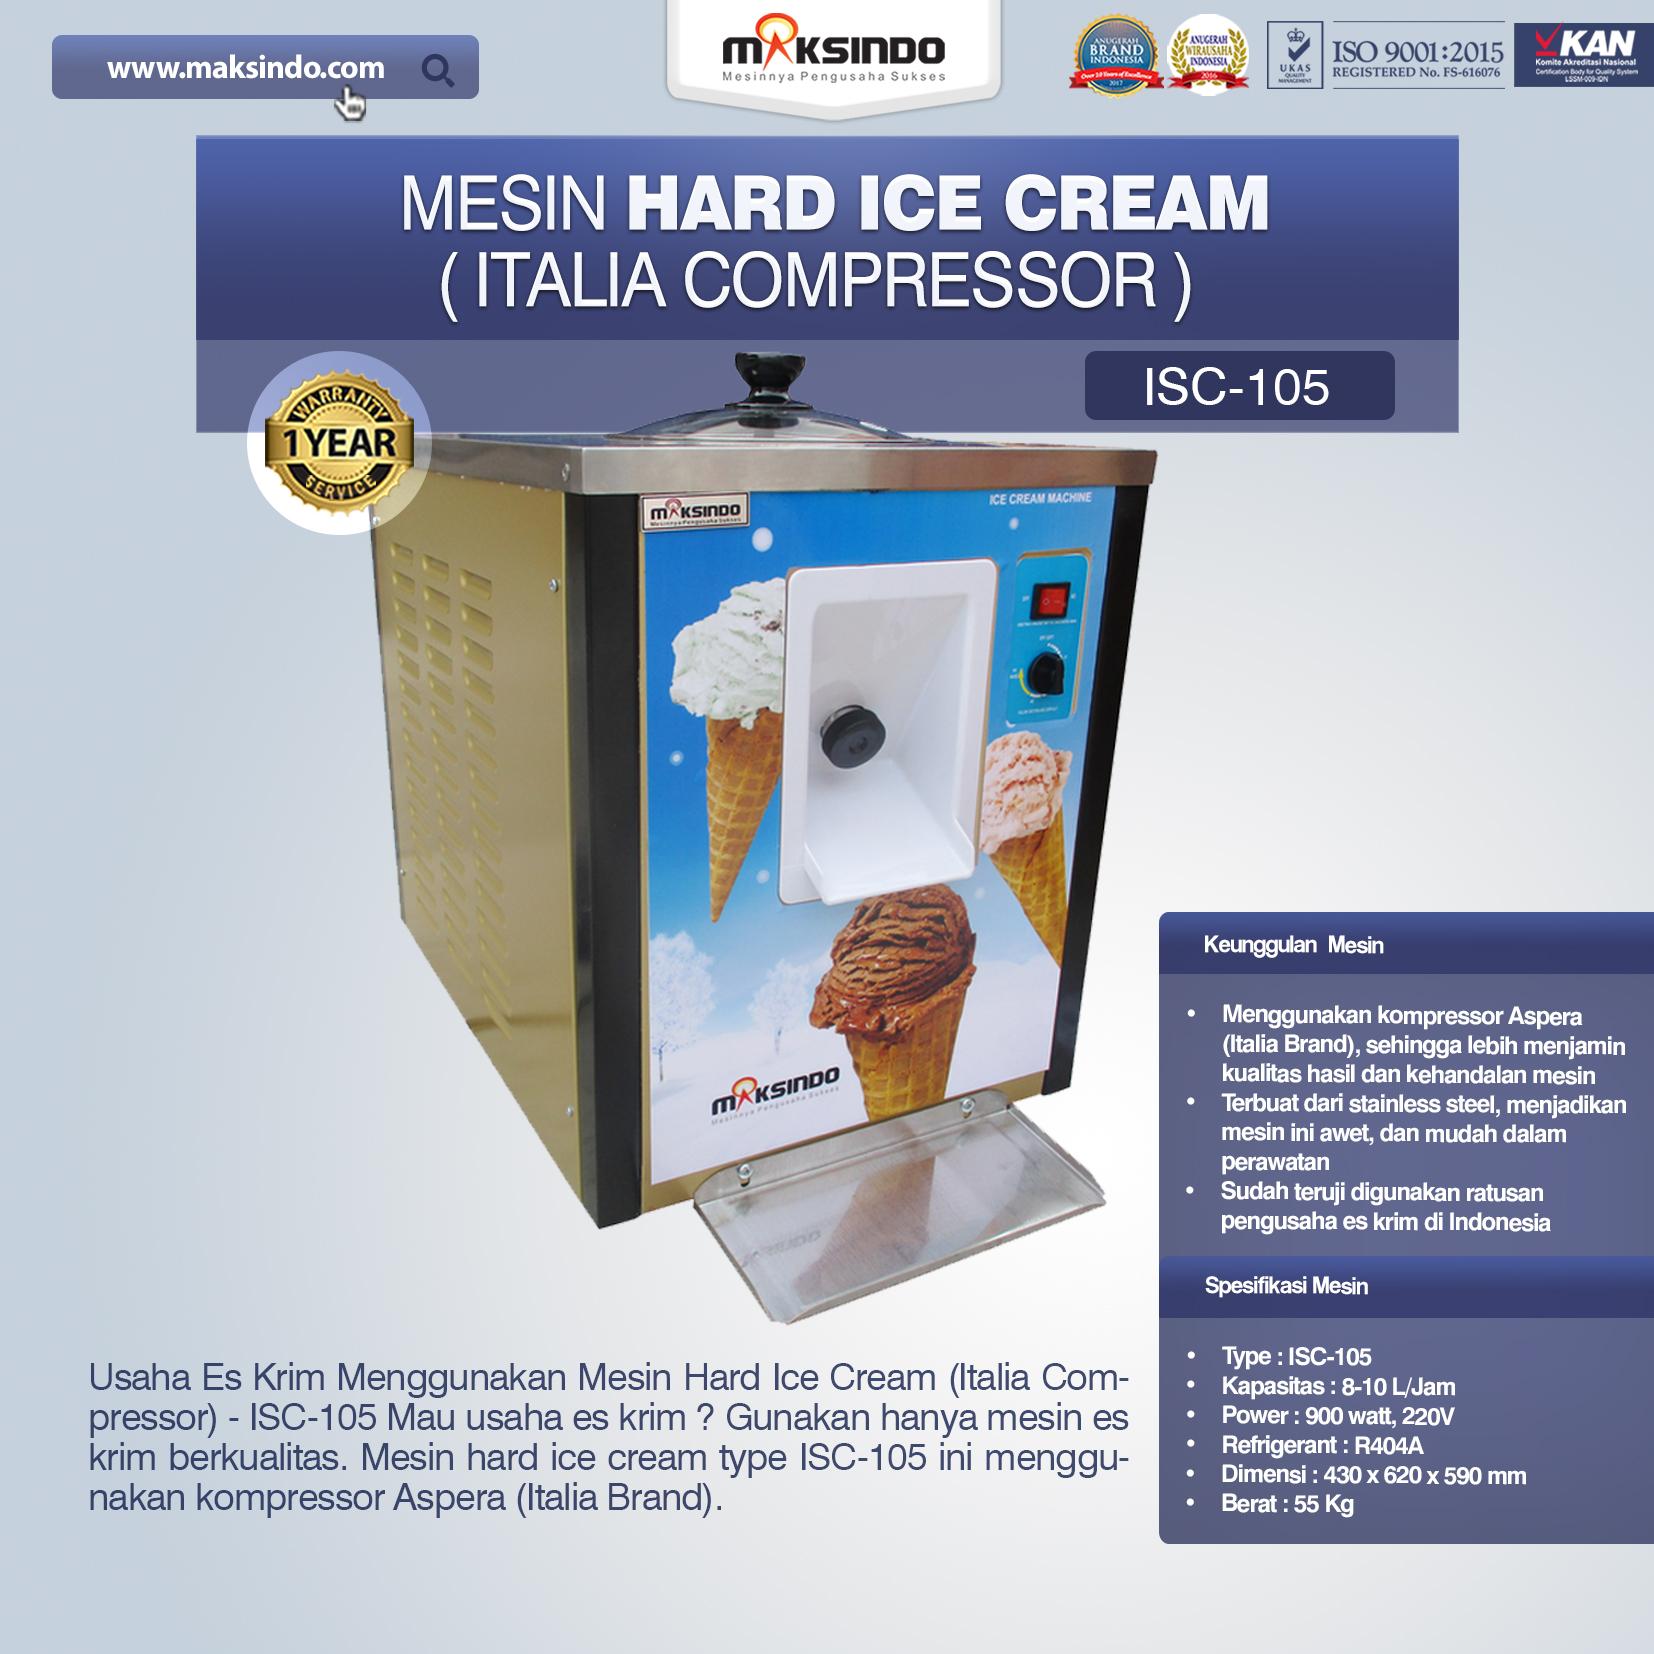 Jual Mesin Hard Ice Cream (Italia Compressor) – ISC-105 di Bandung